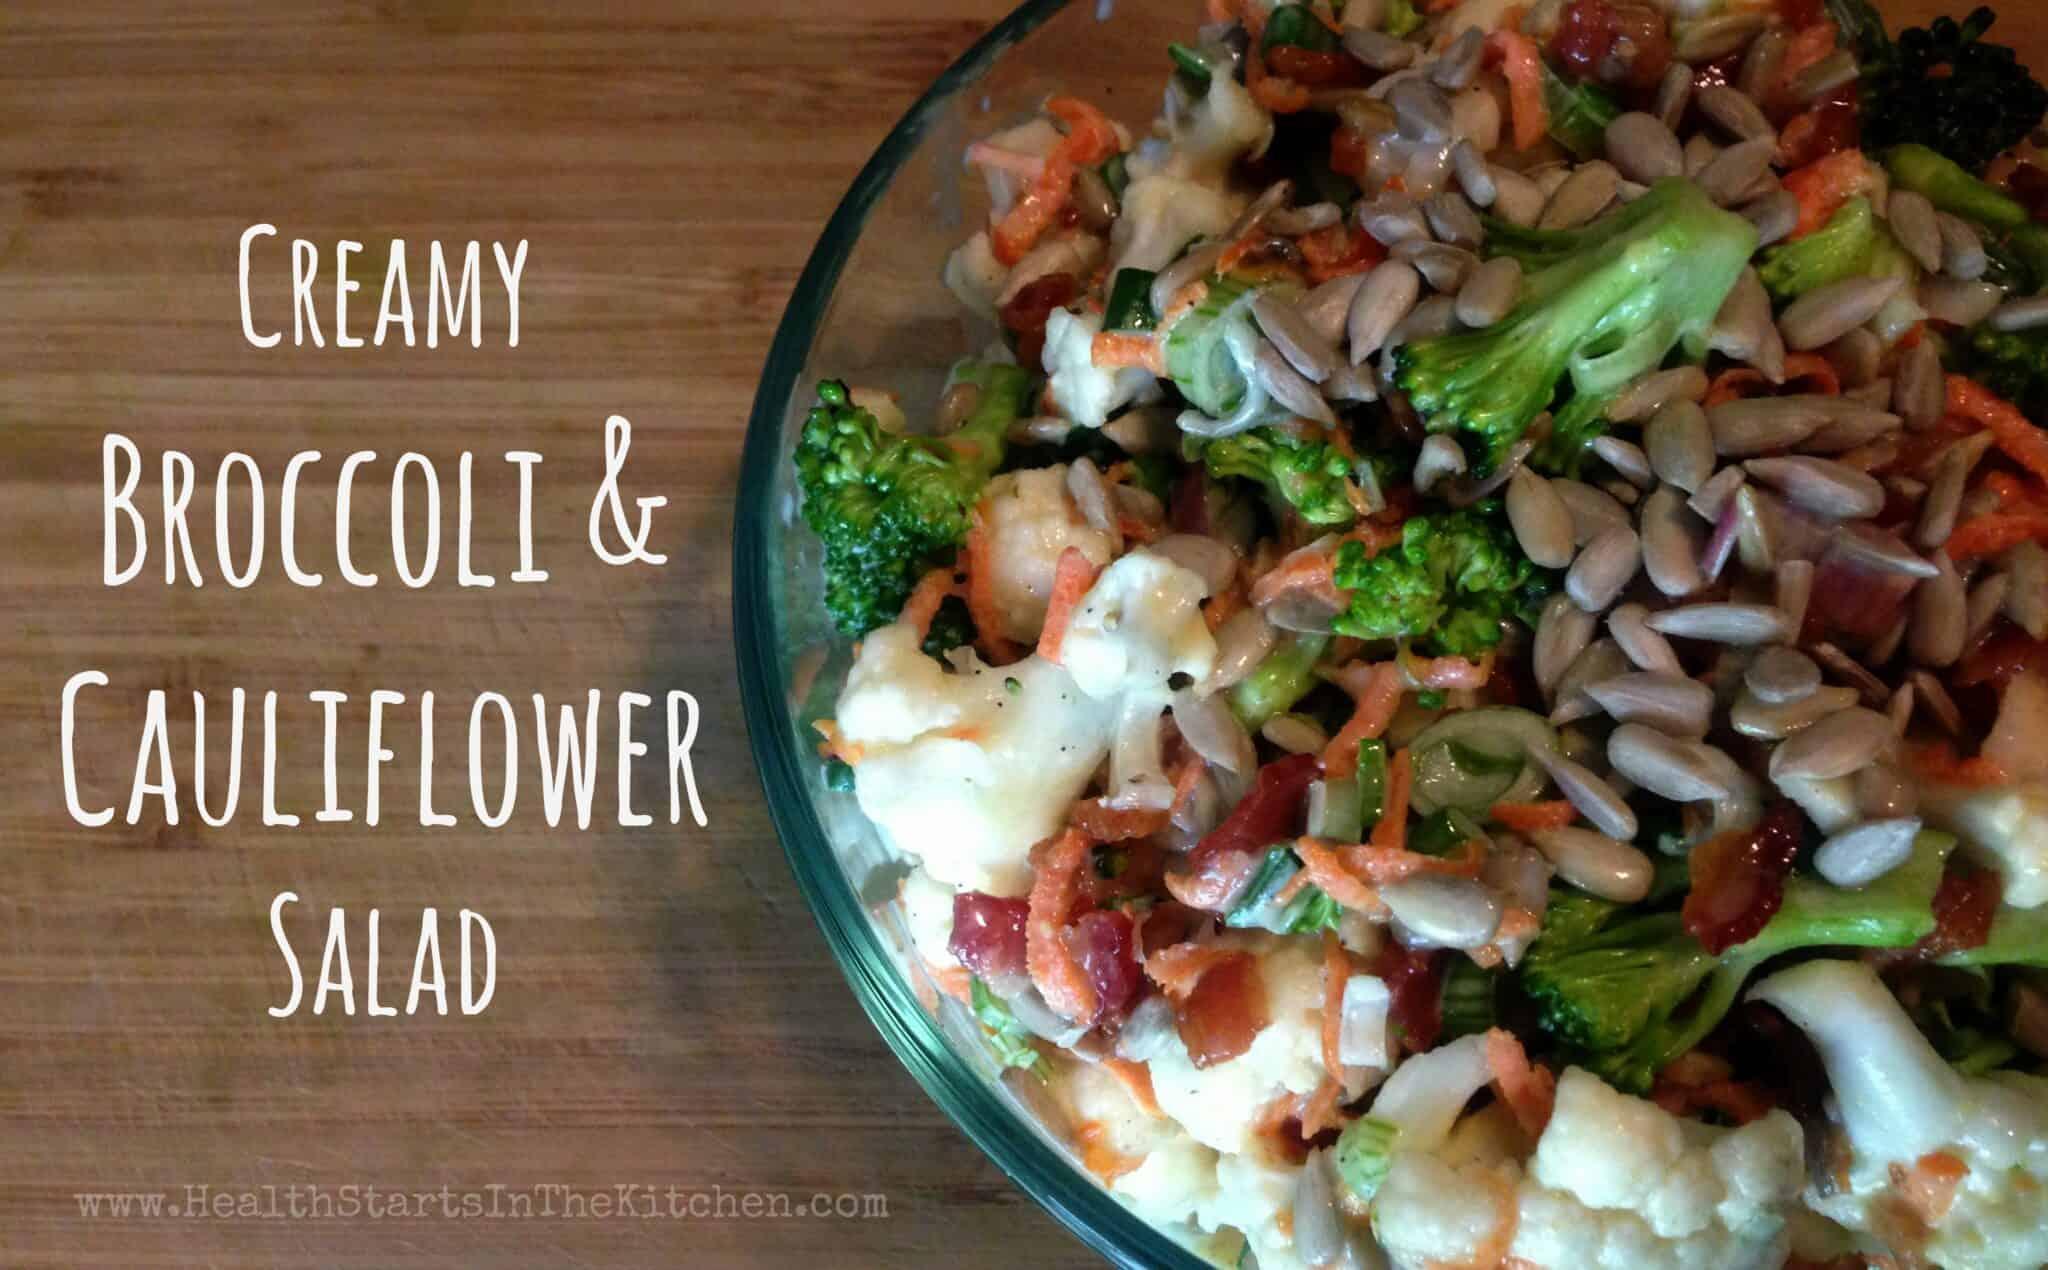 Creamy Broccoli & Cauliflower Salad